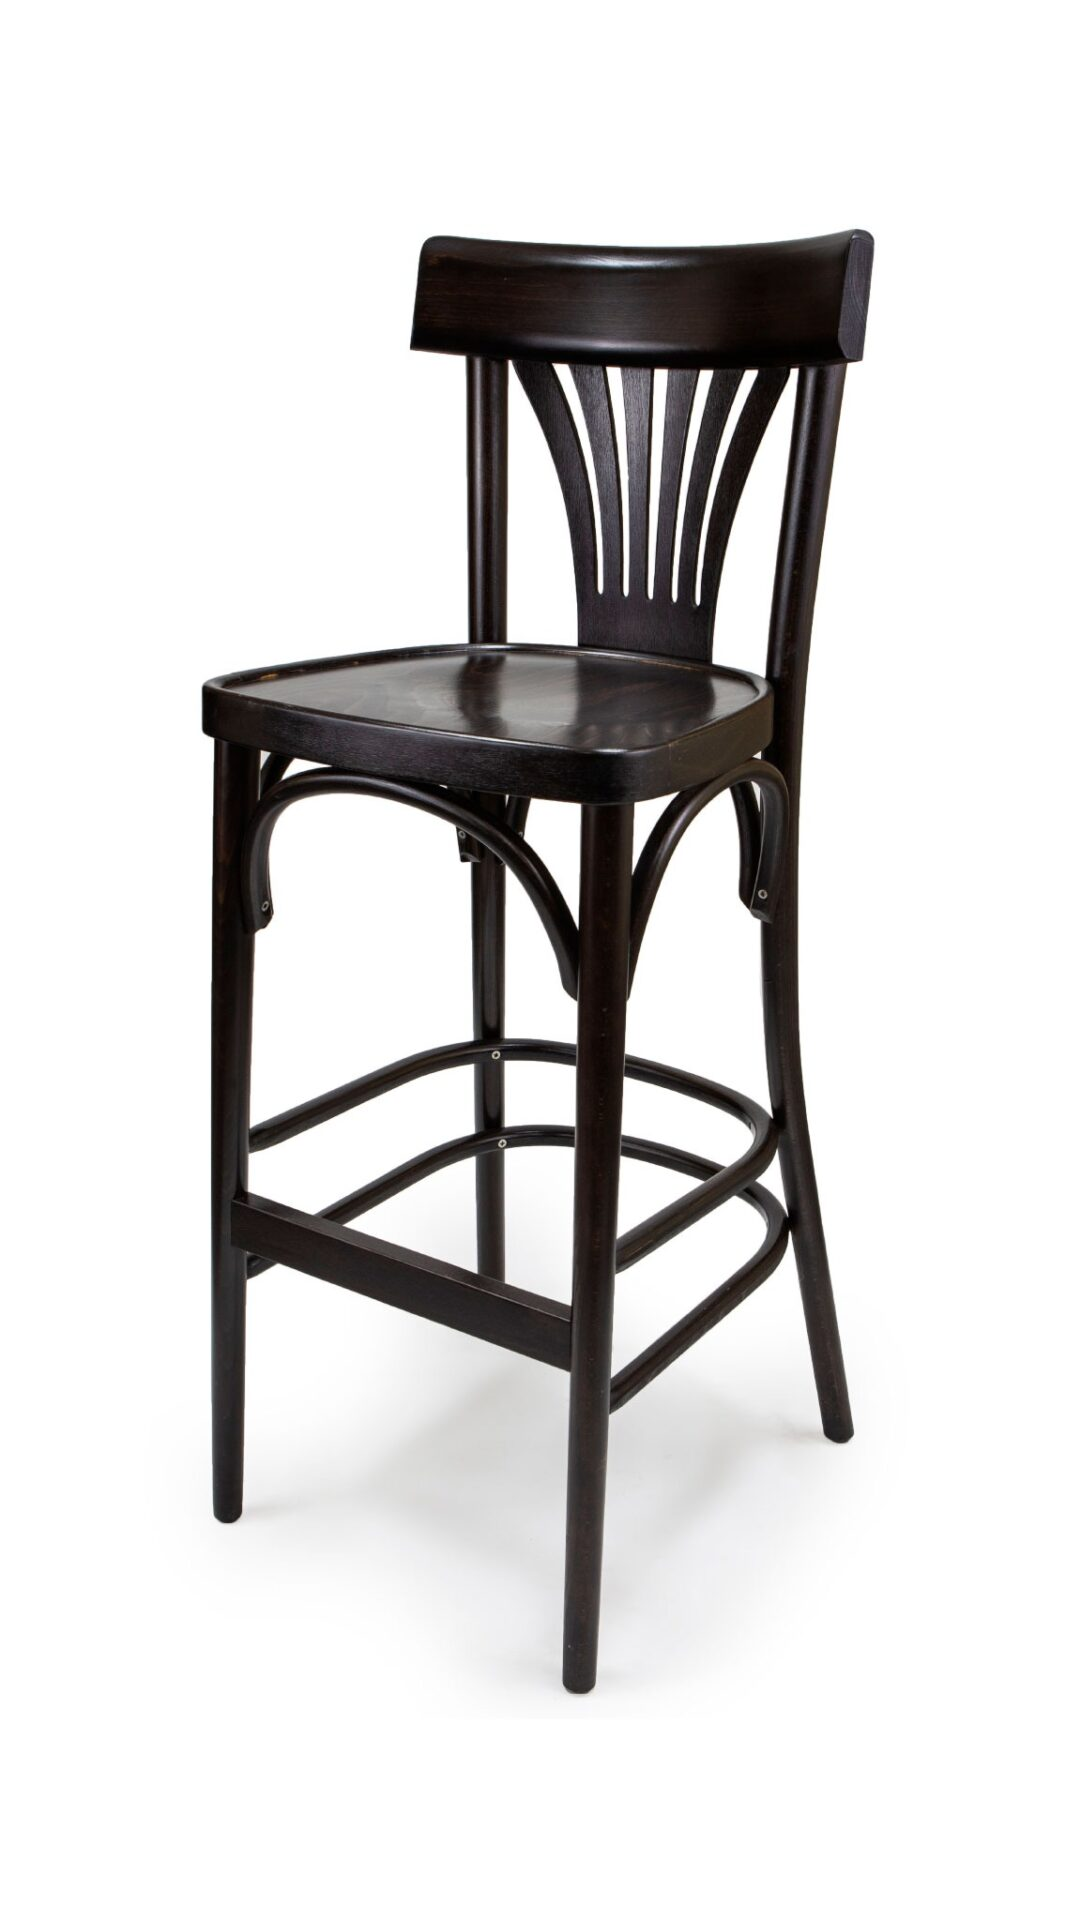 Solid Wood bar stool made of Beech - 1320B